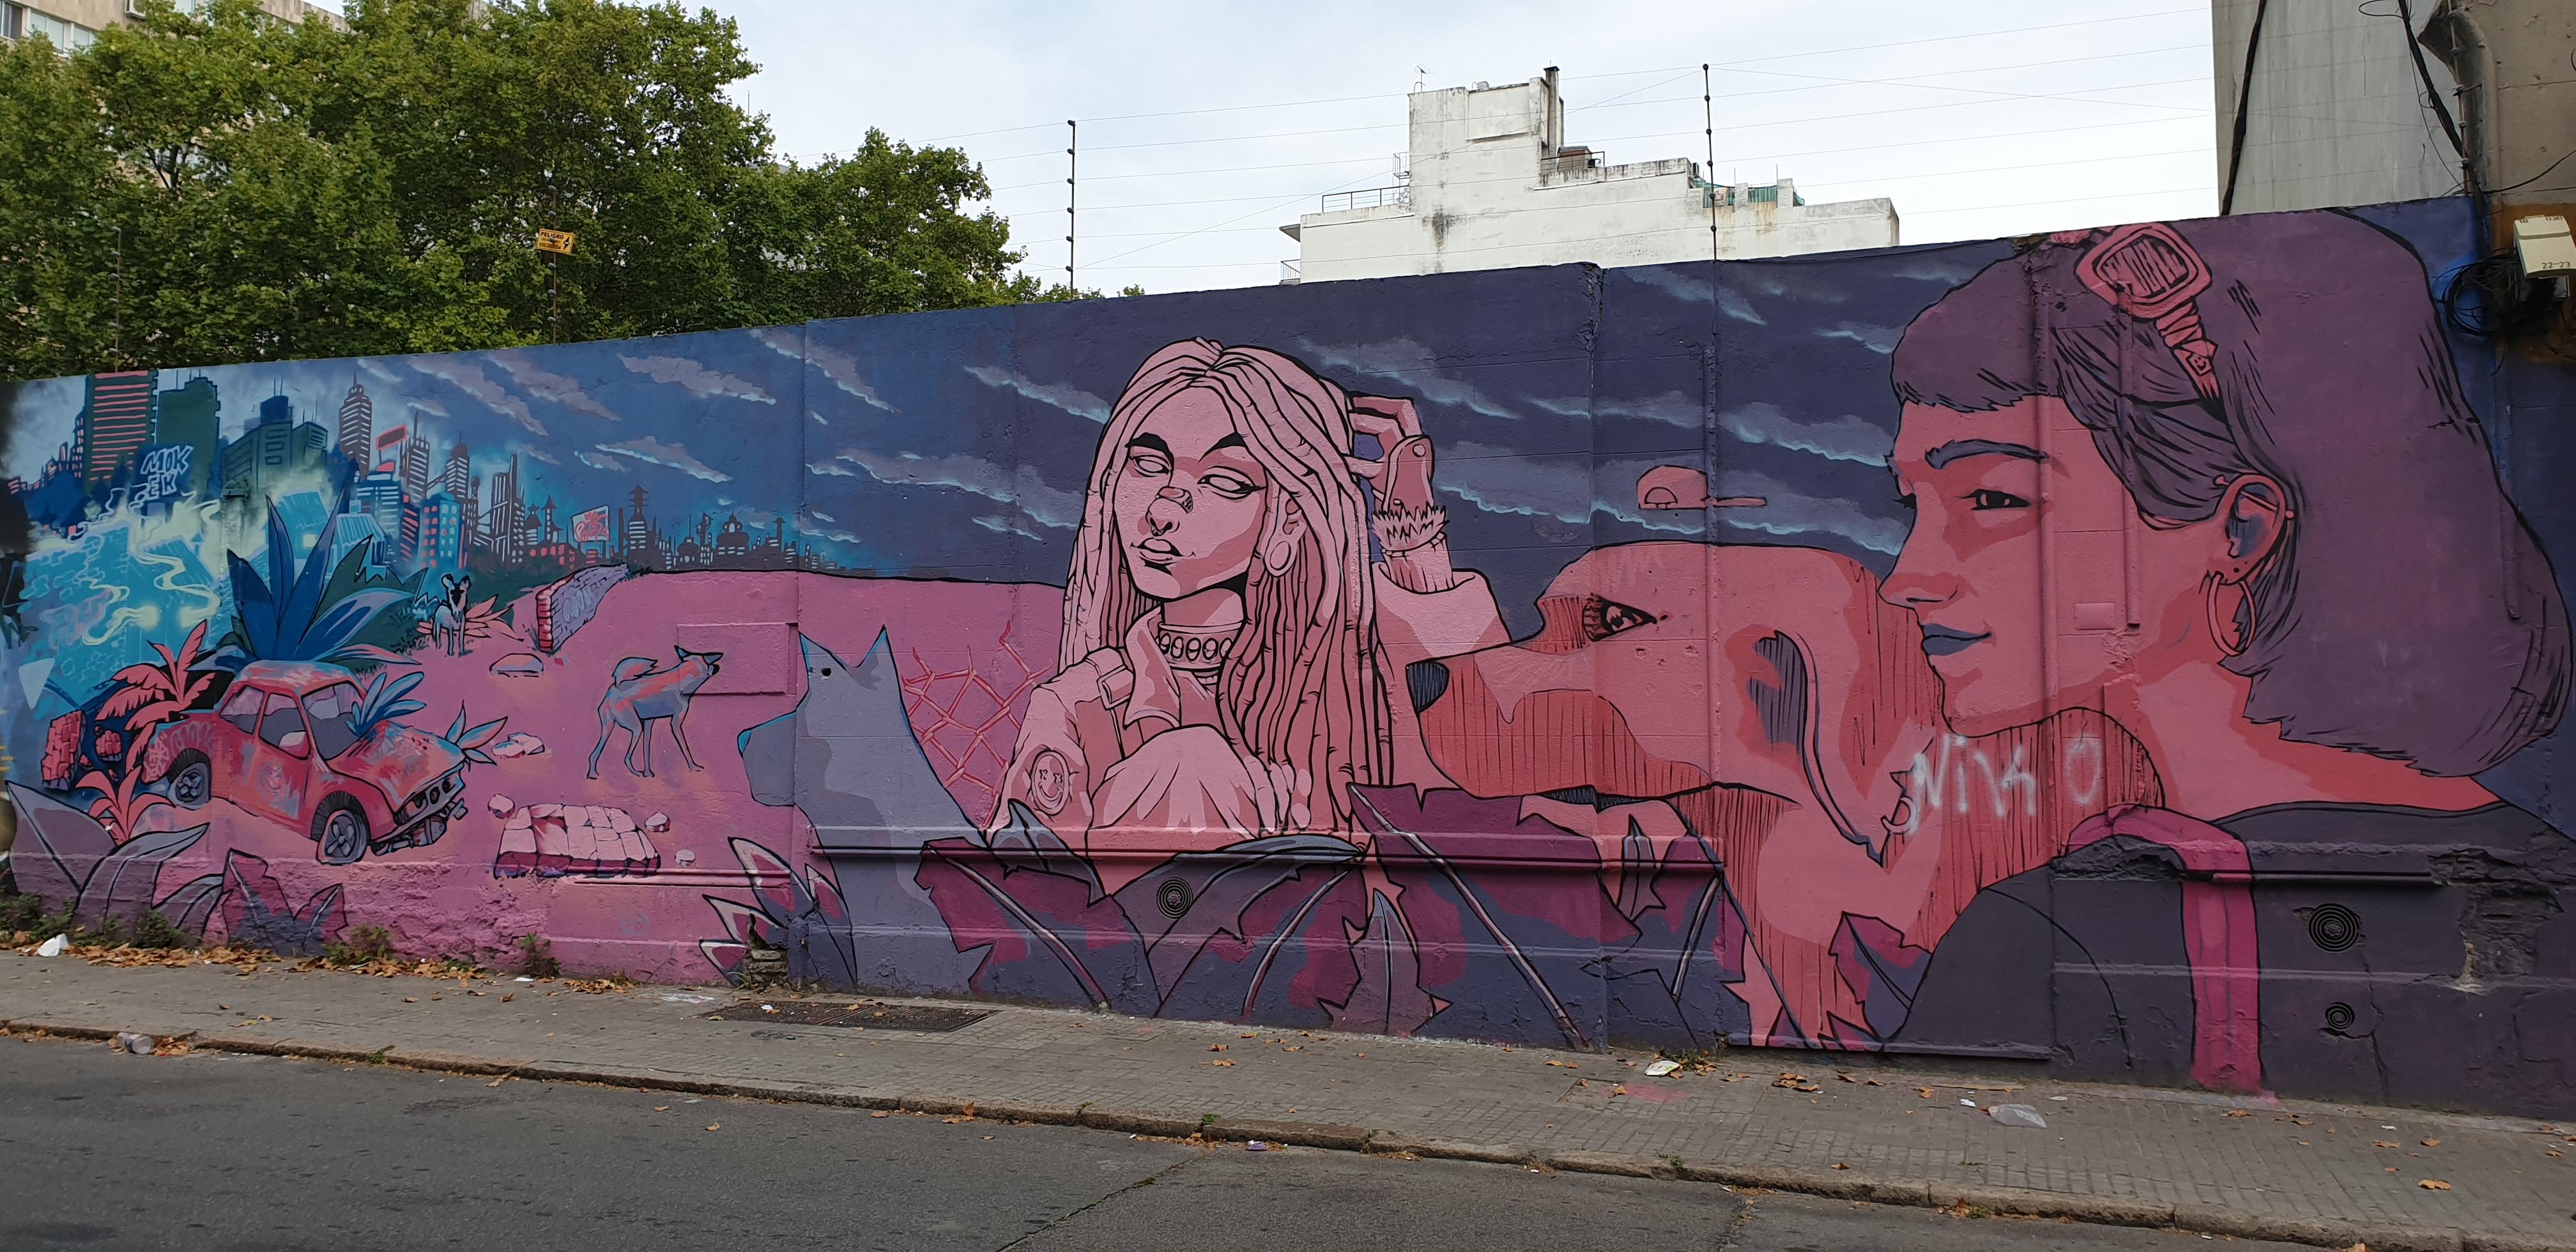 Mur réalisé par Pardos , Ganga Positive - Montevideo - Uruguay 2020 - ©nofakeinmynews.com